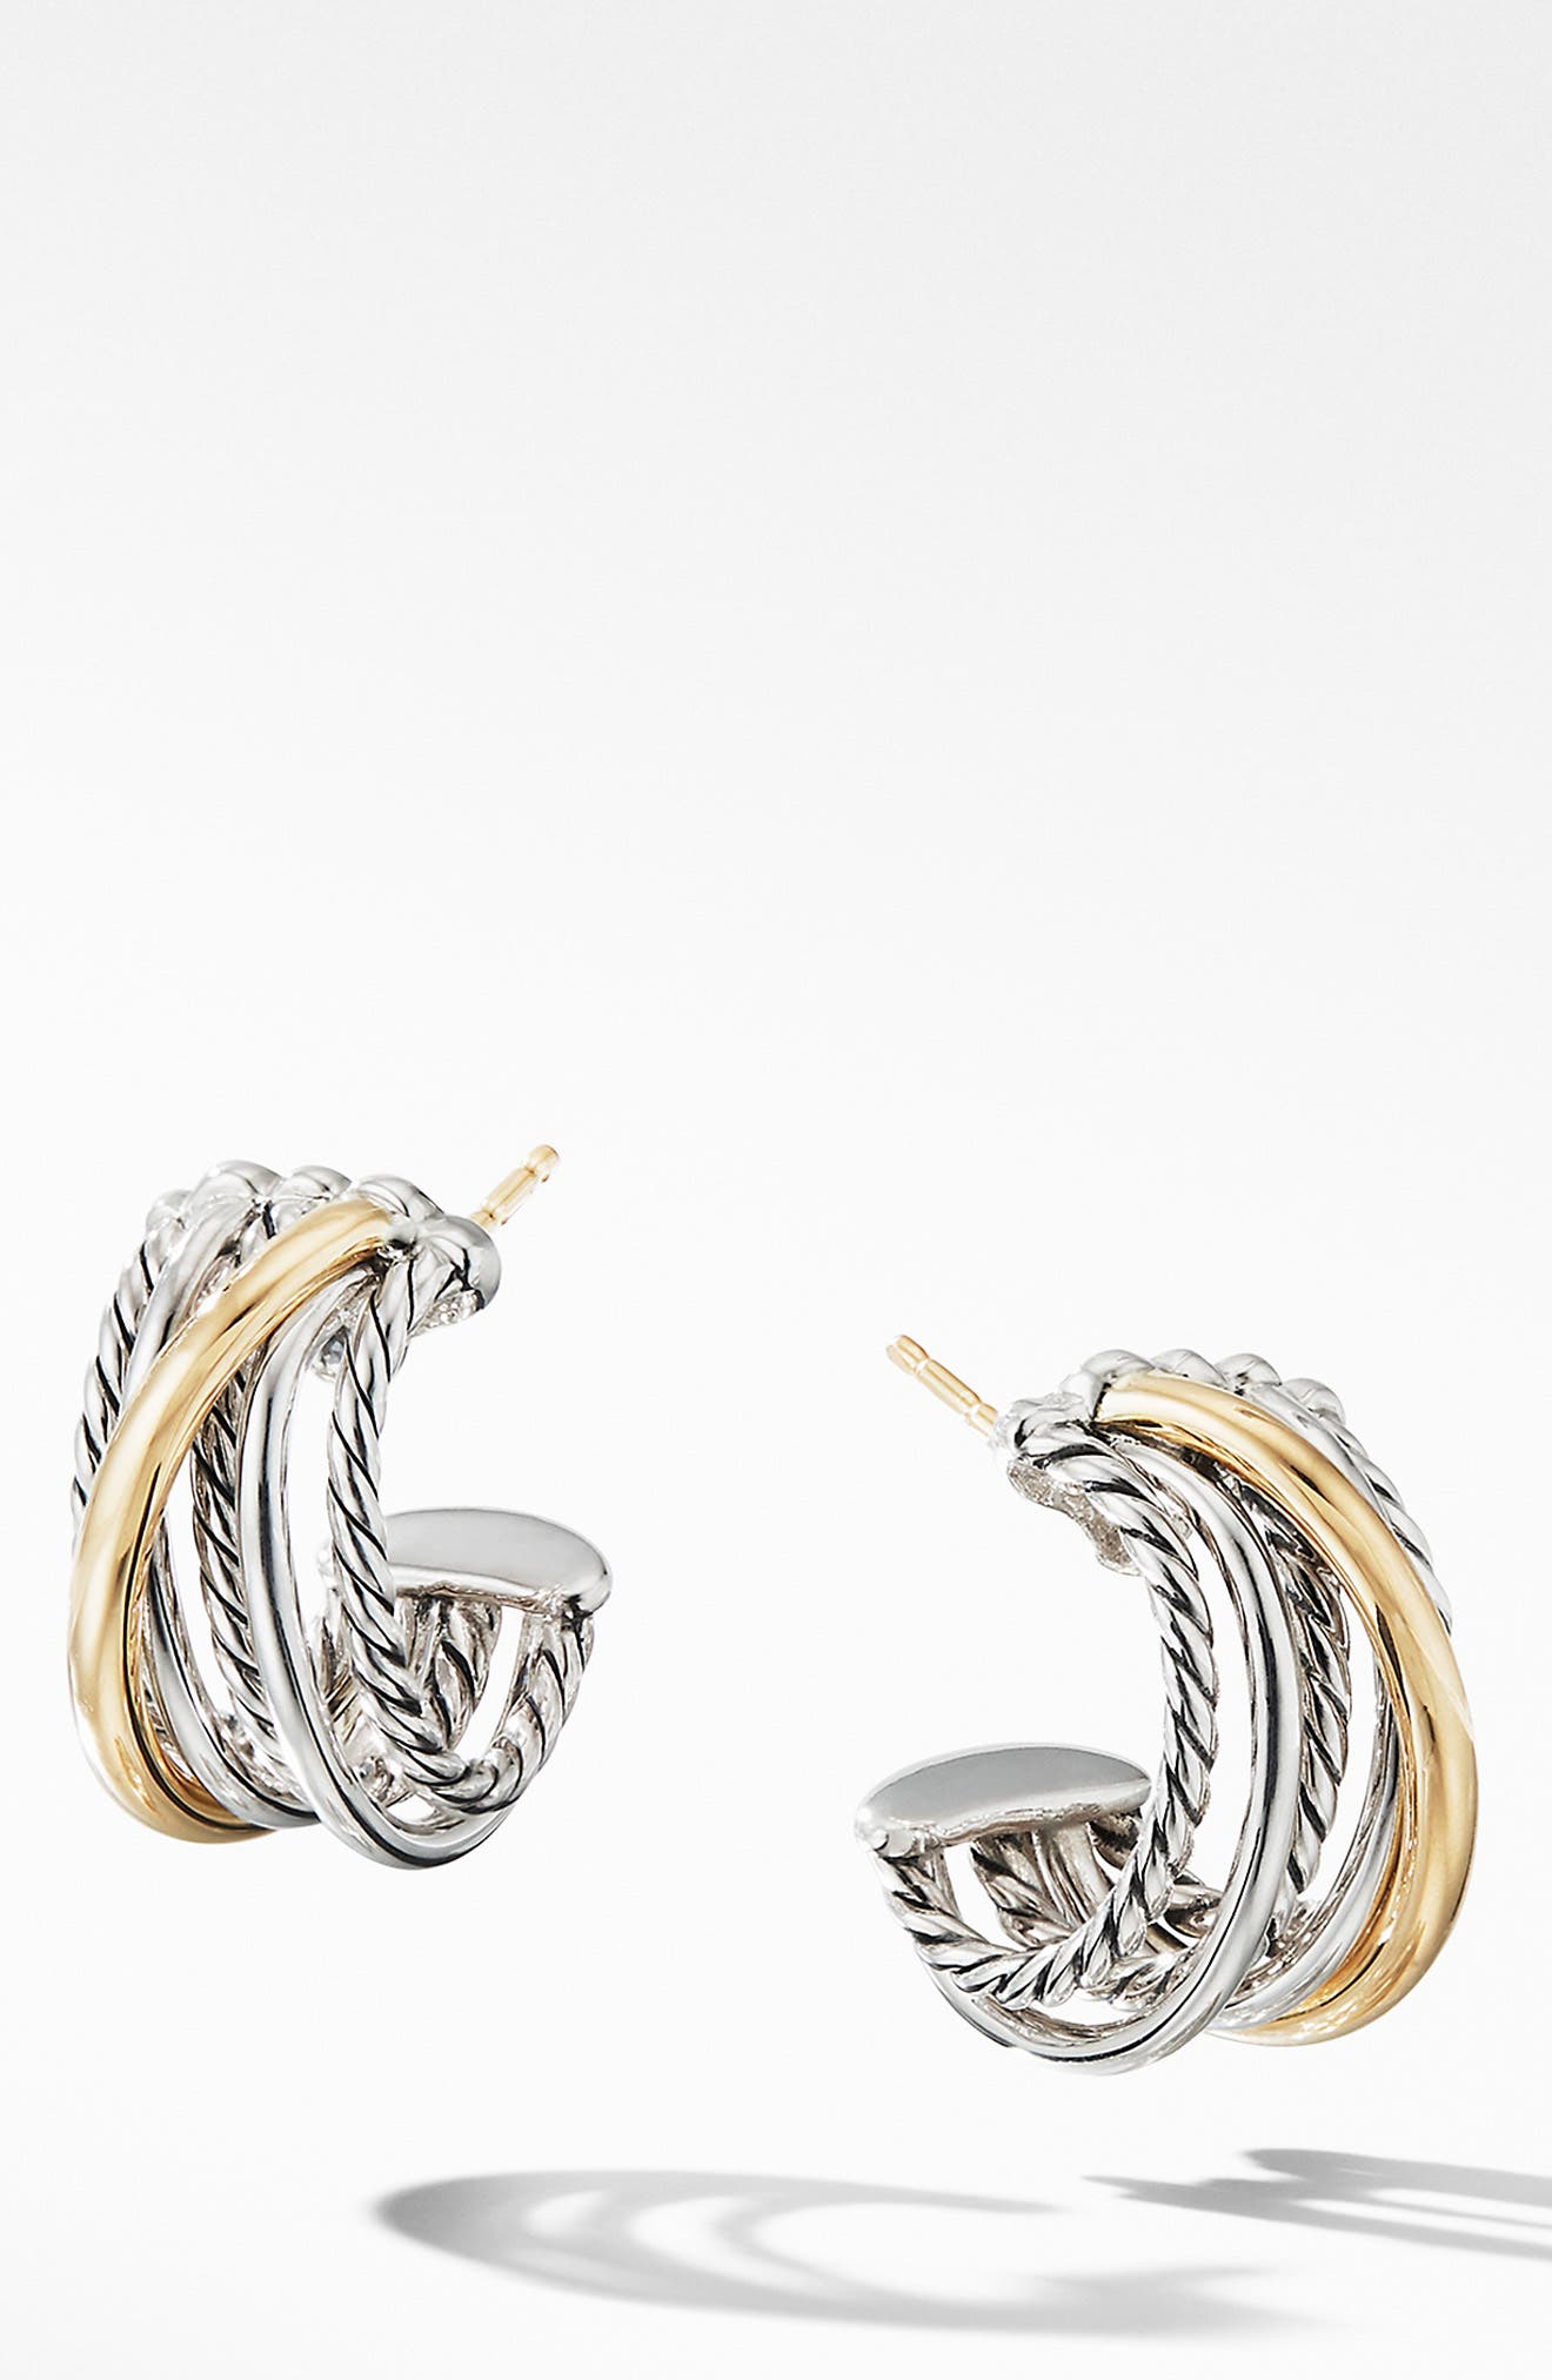 DAVID YURMAN Crossover Huggie Hoop Earrings, Main, color, SILVER/ GOLD